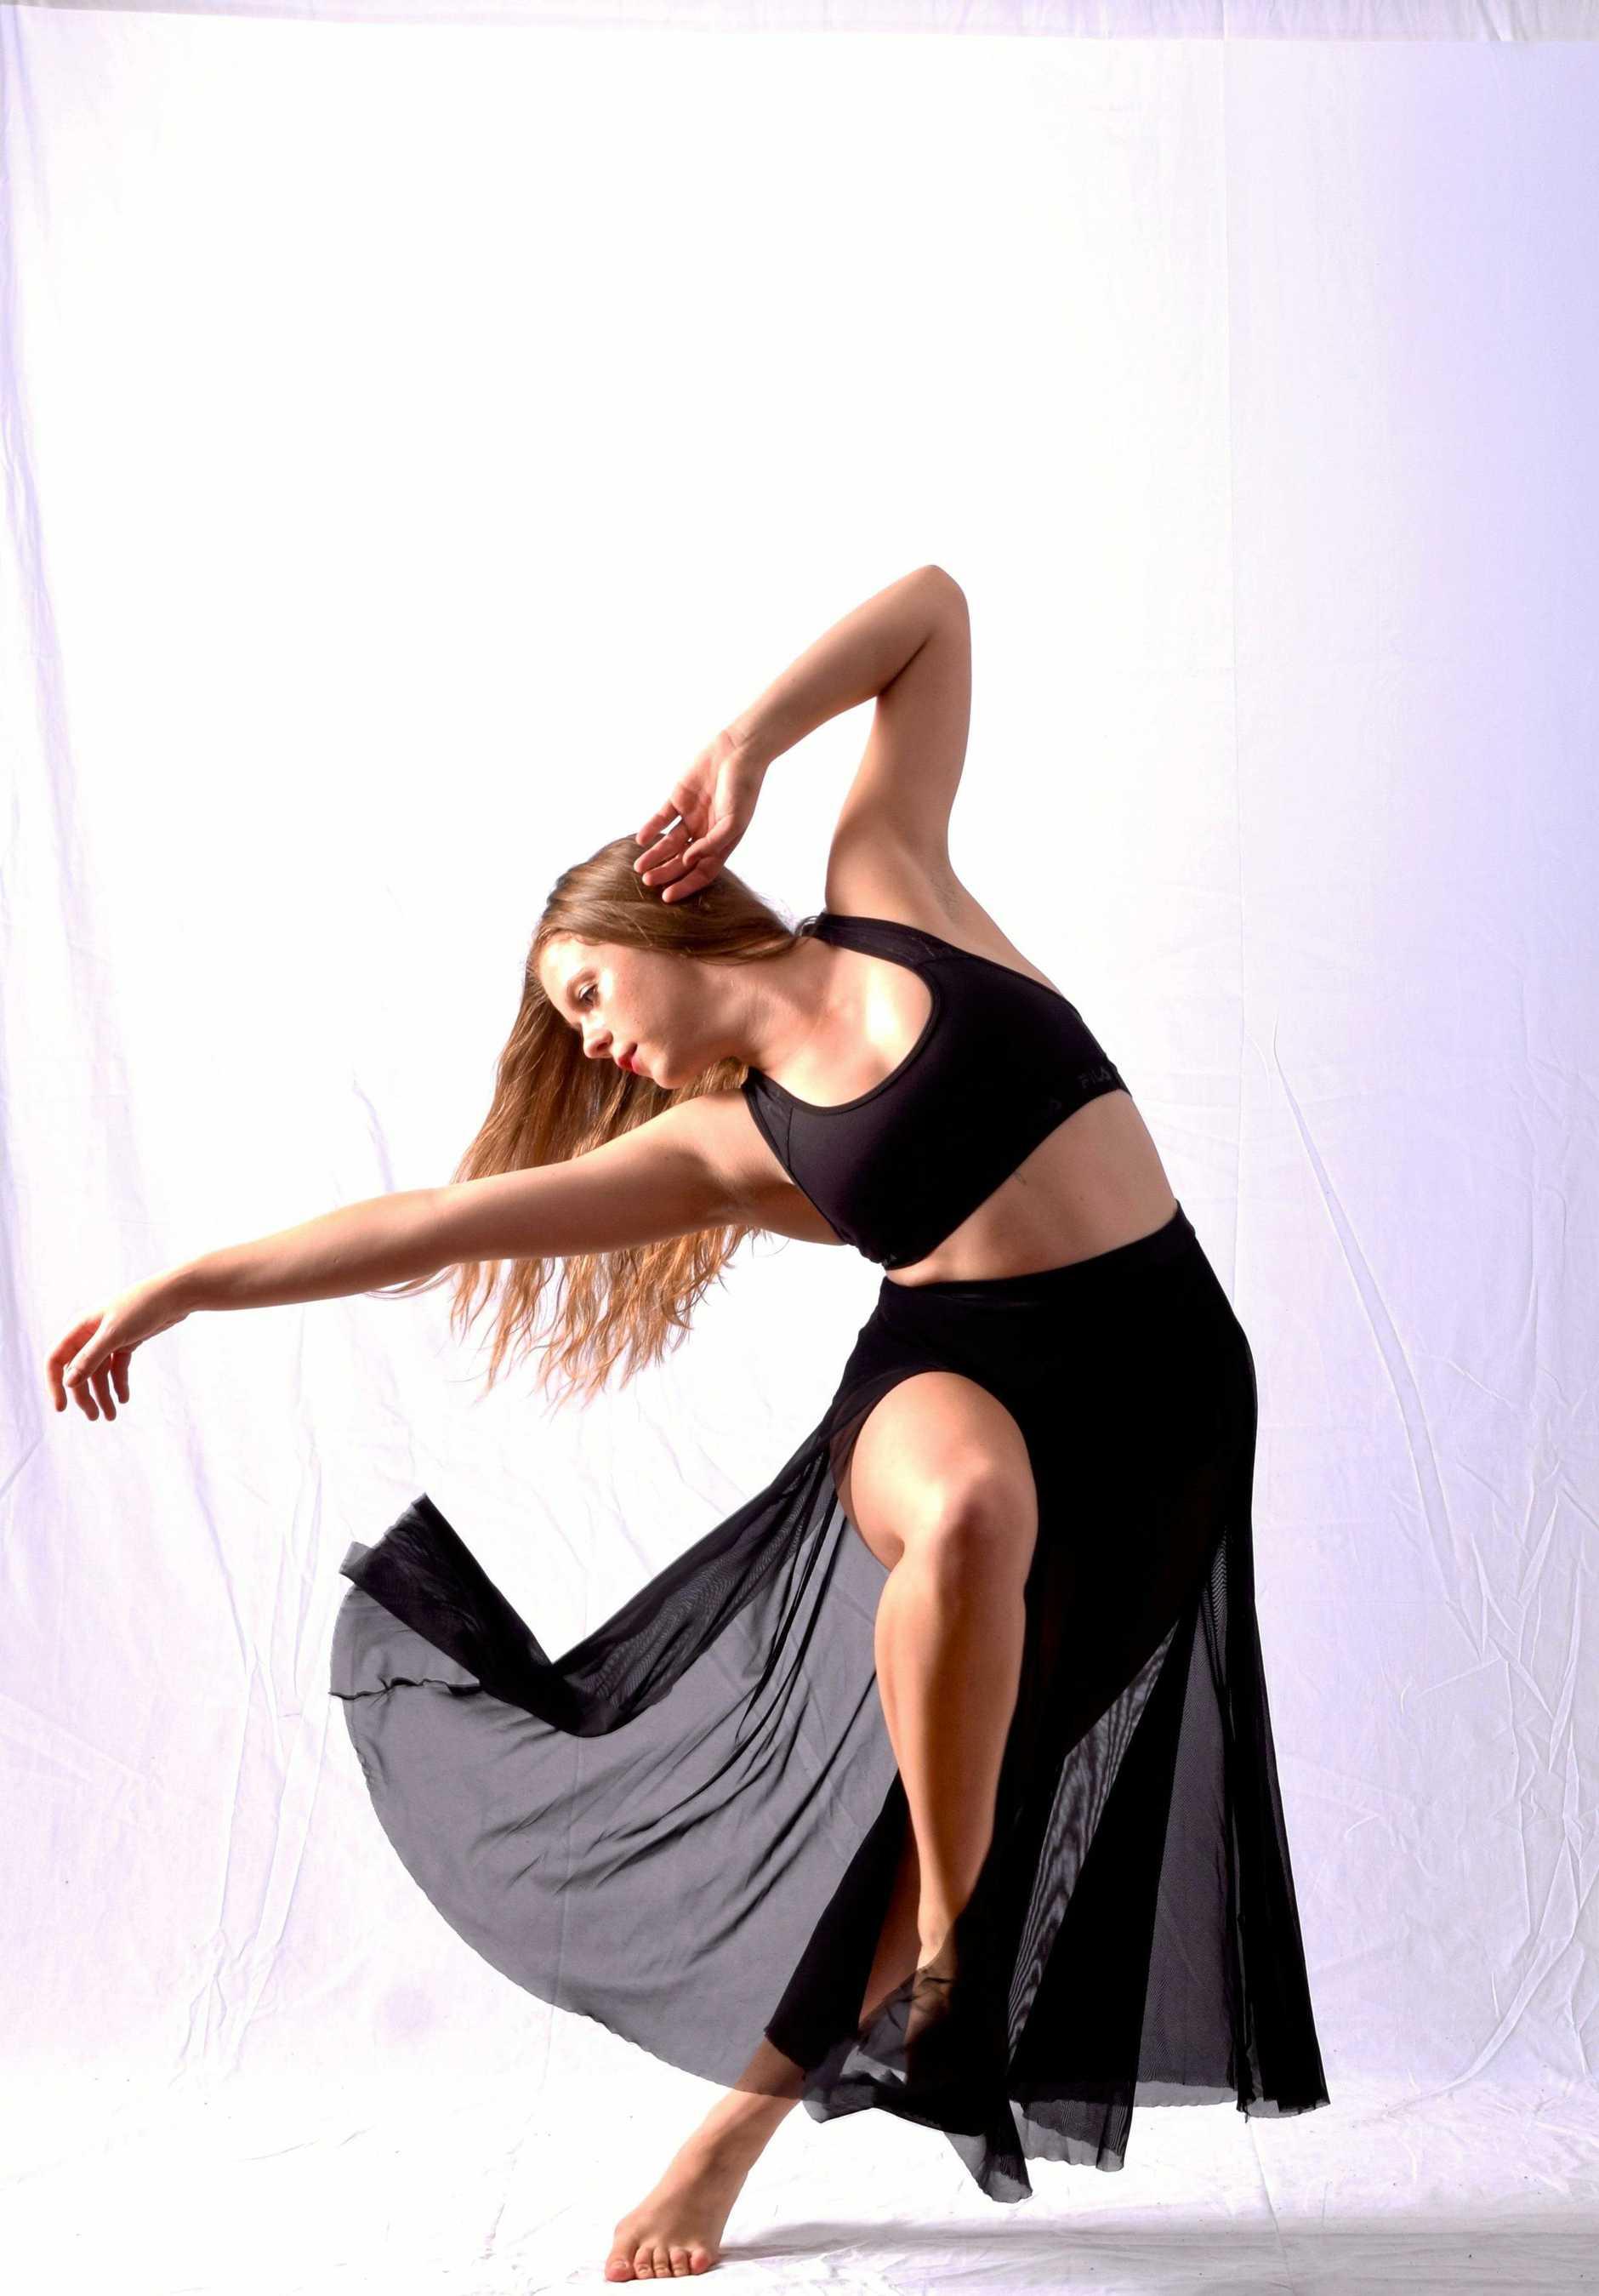 APPRECIATION OF THE ARTS: Neo Vida will combine art and dance when it presents Voyage at The J, Noosa.